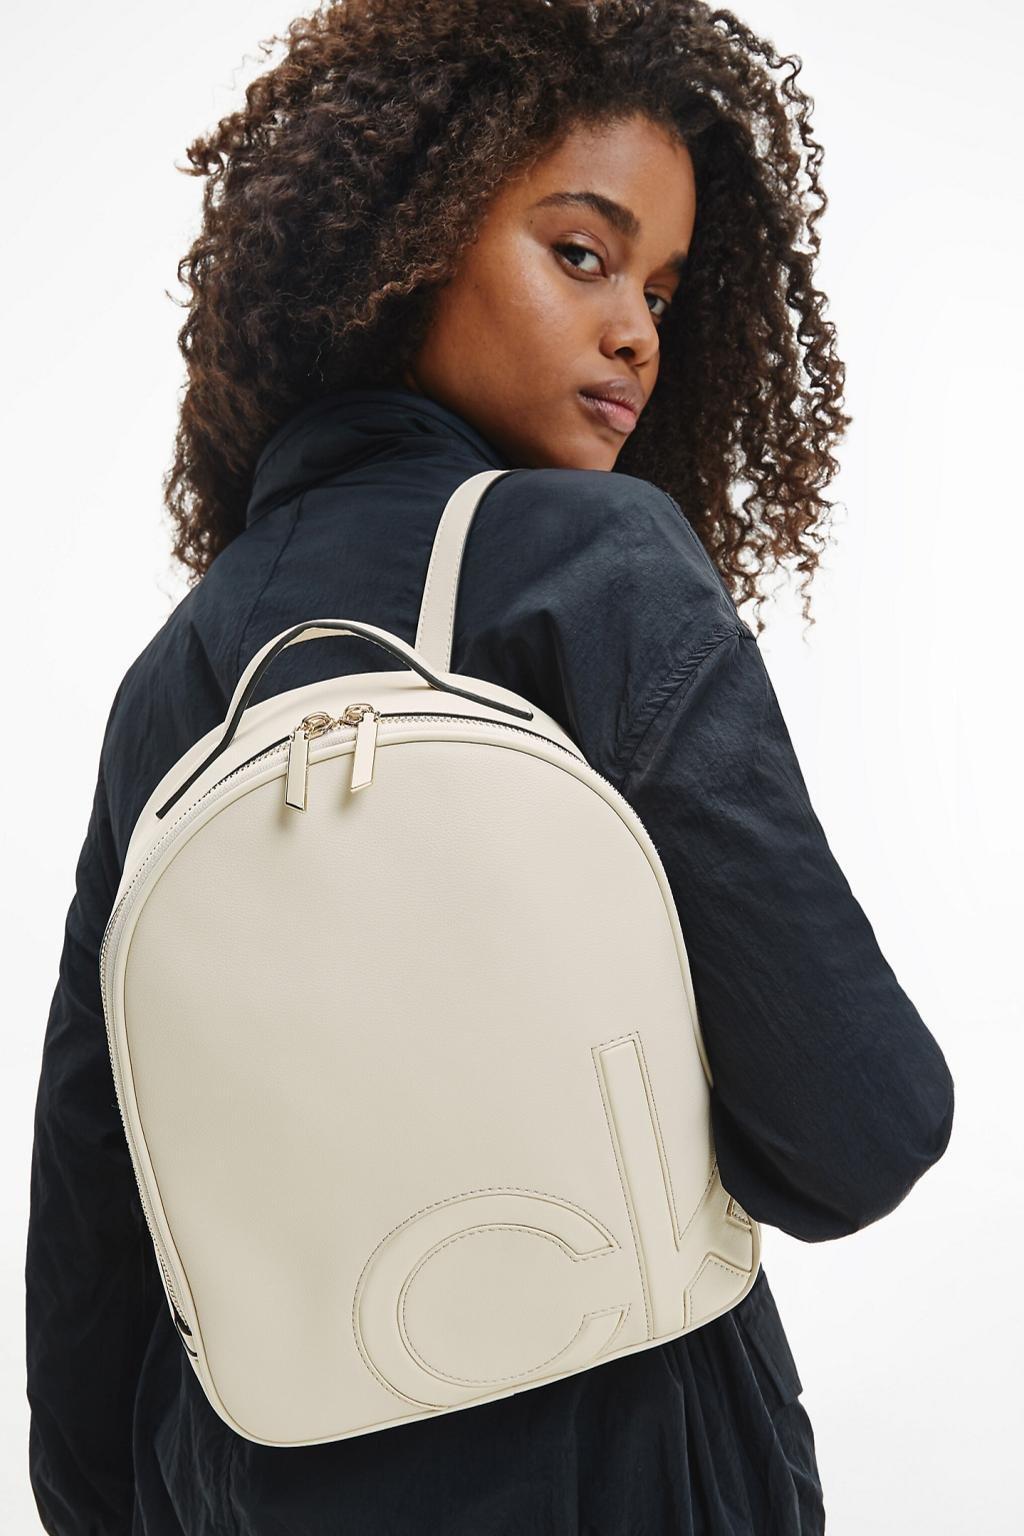 Calvin Klein batoh dámský - smetanová